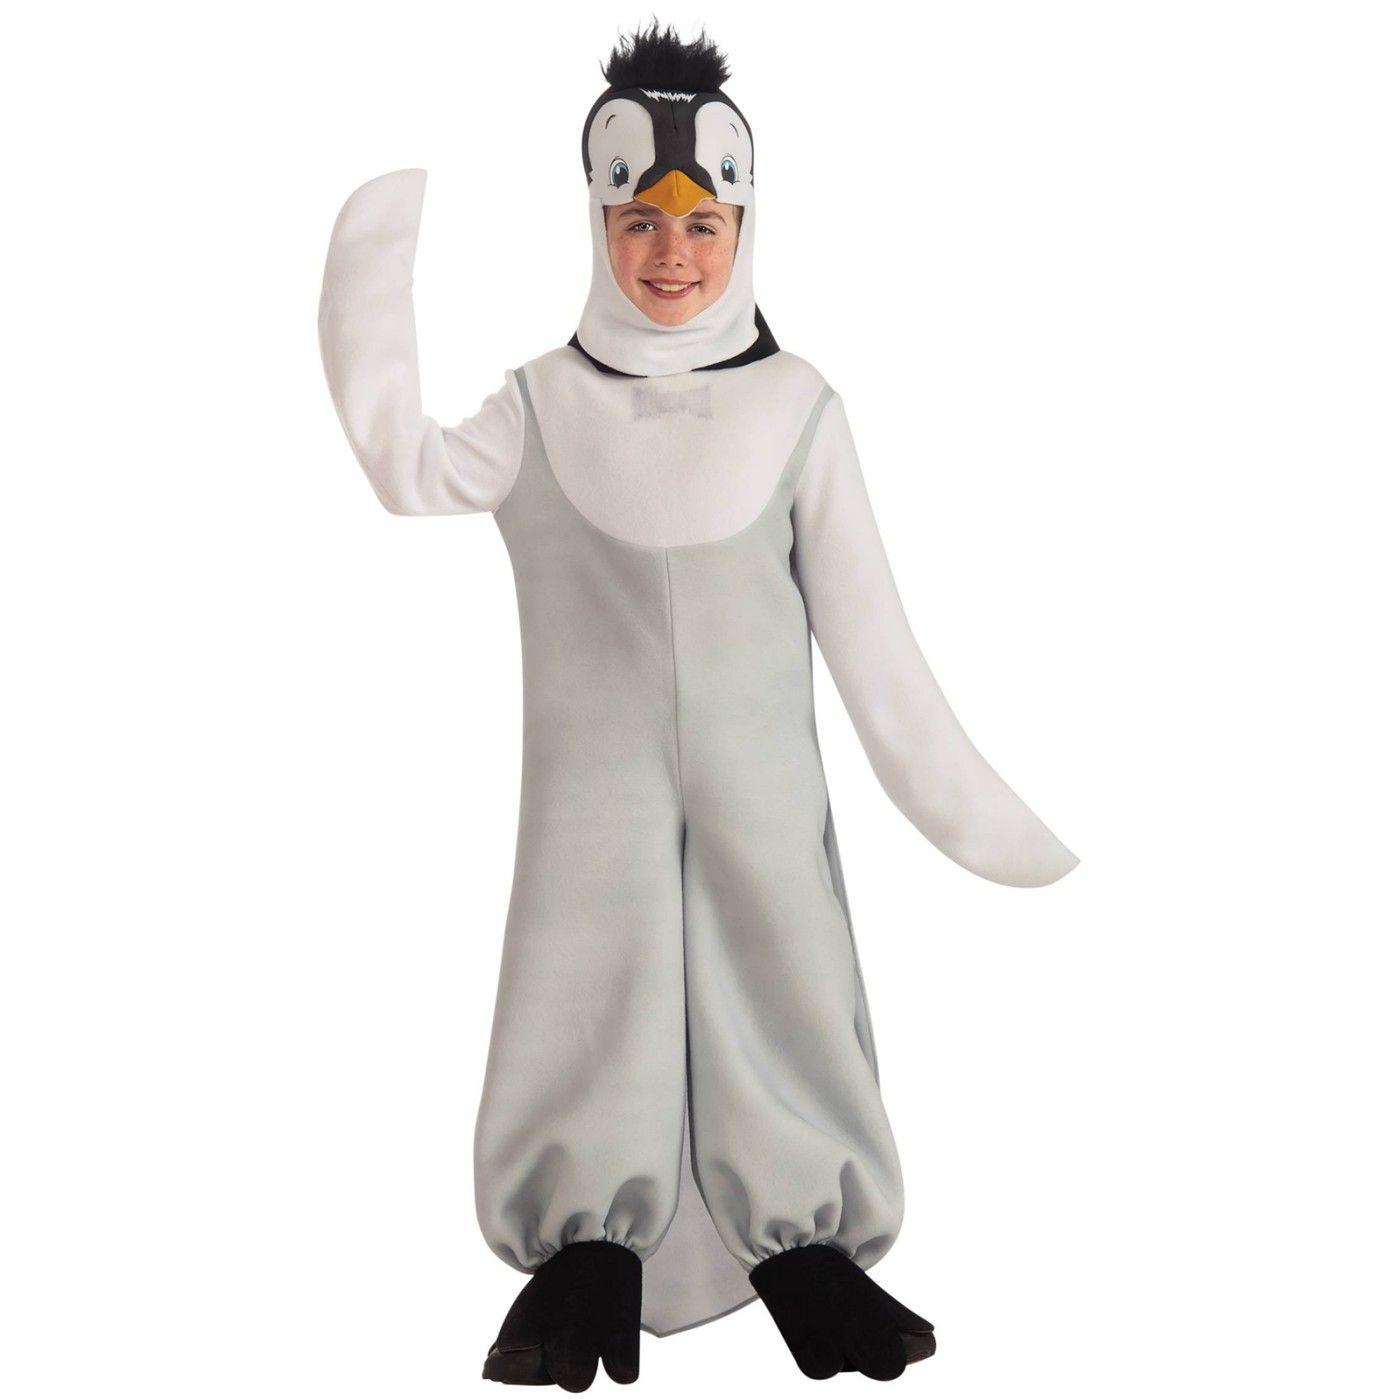 Adorable Penguin Costume for kids  sc 1 st  Pinterest & Penguin Costume - Kids Deluxe | Pinterest | Penguin costume ...